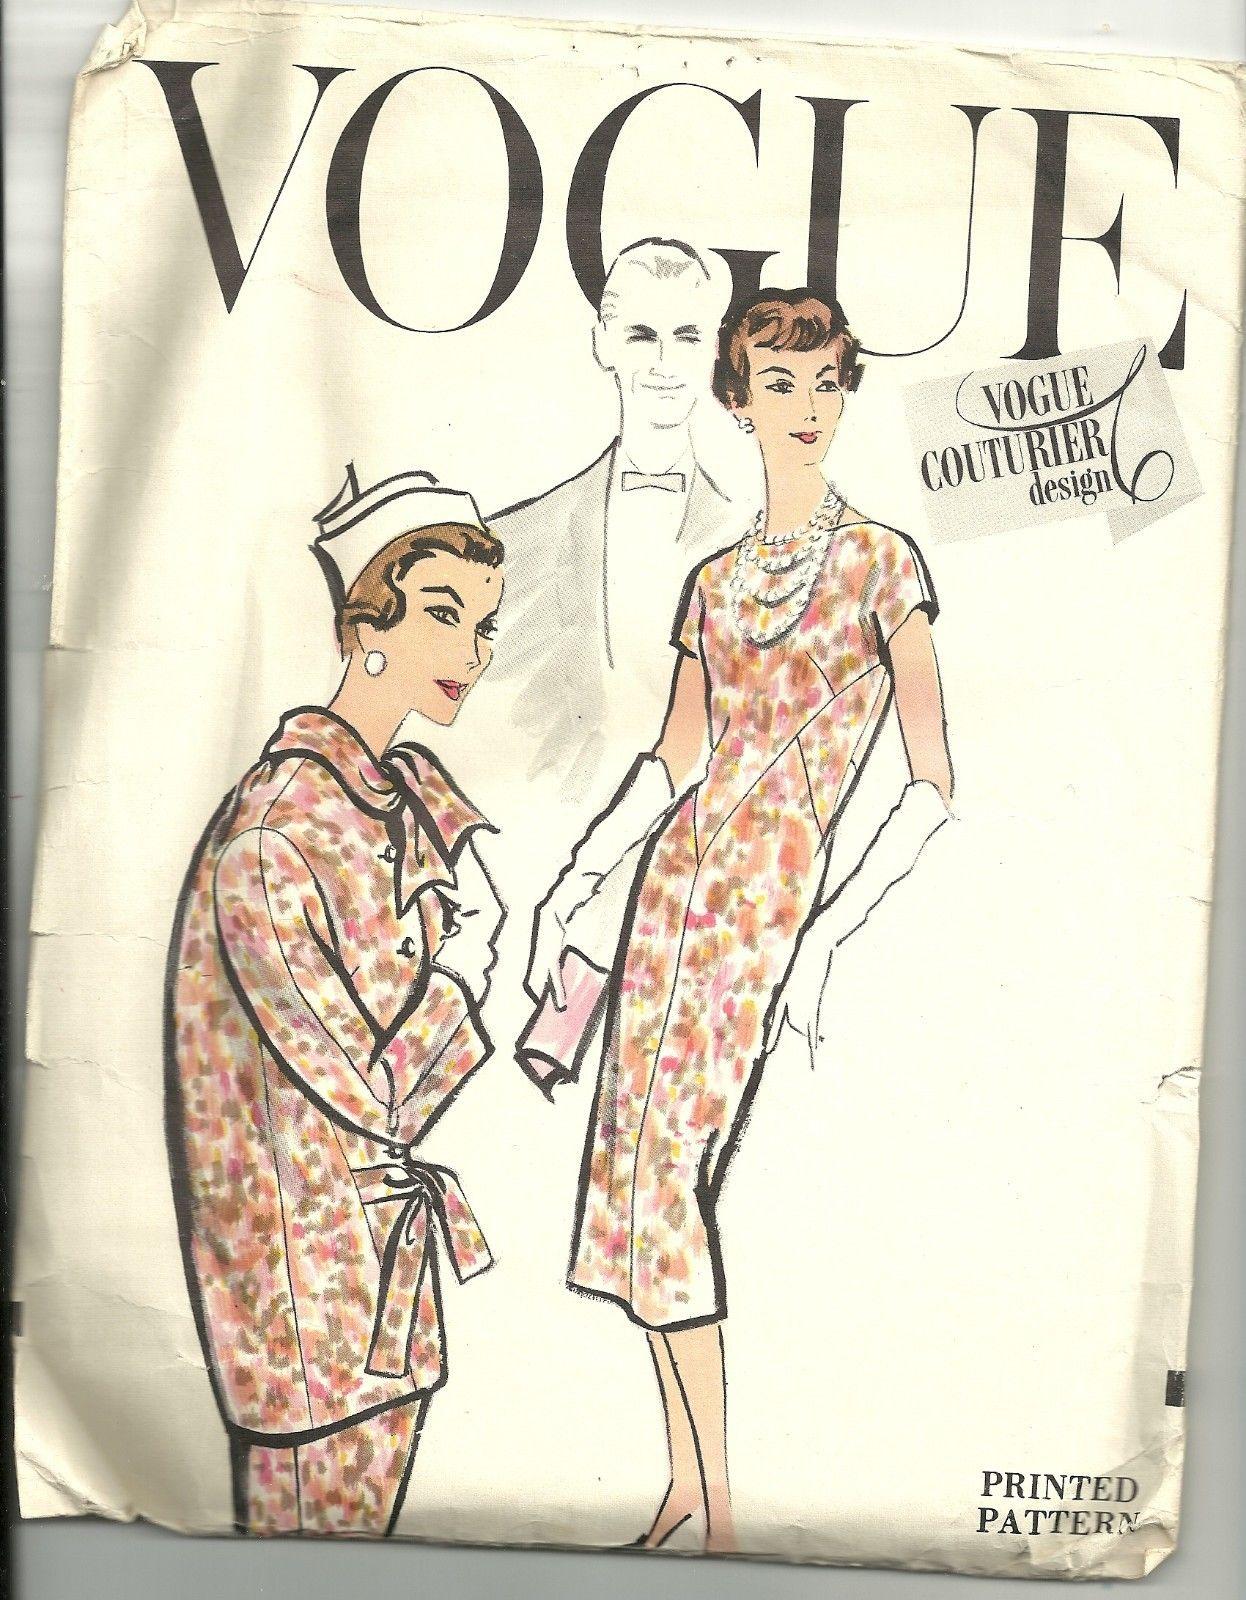 Vogue 103